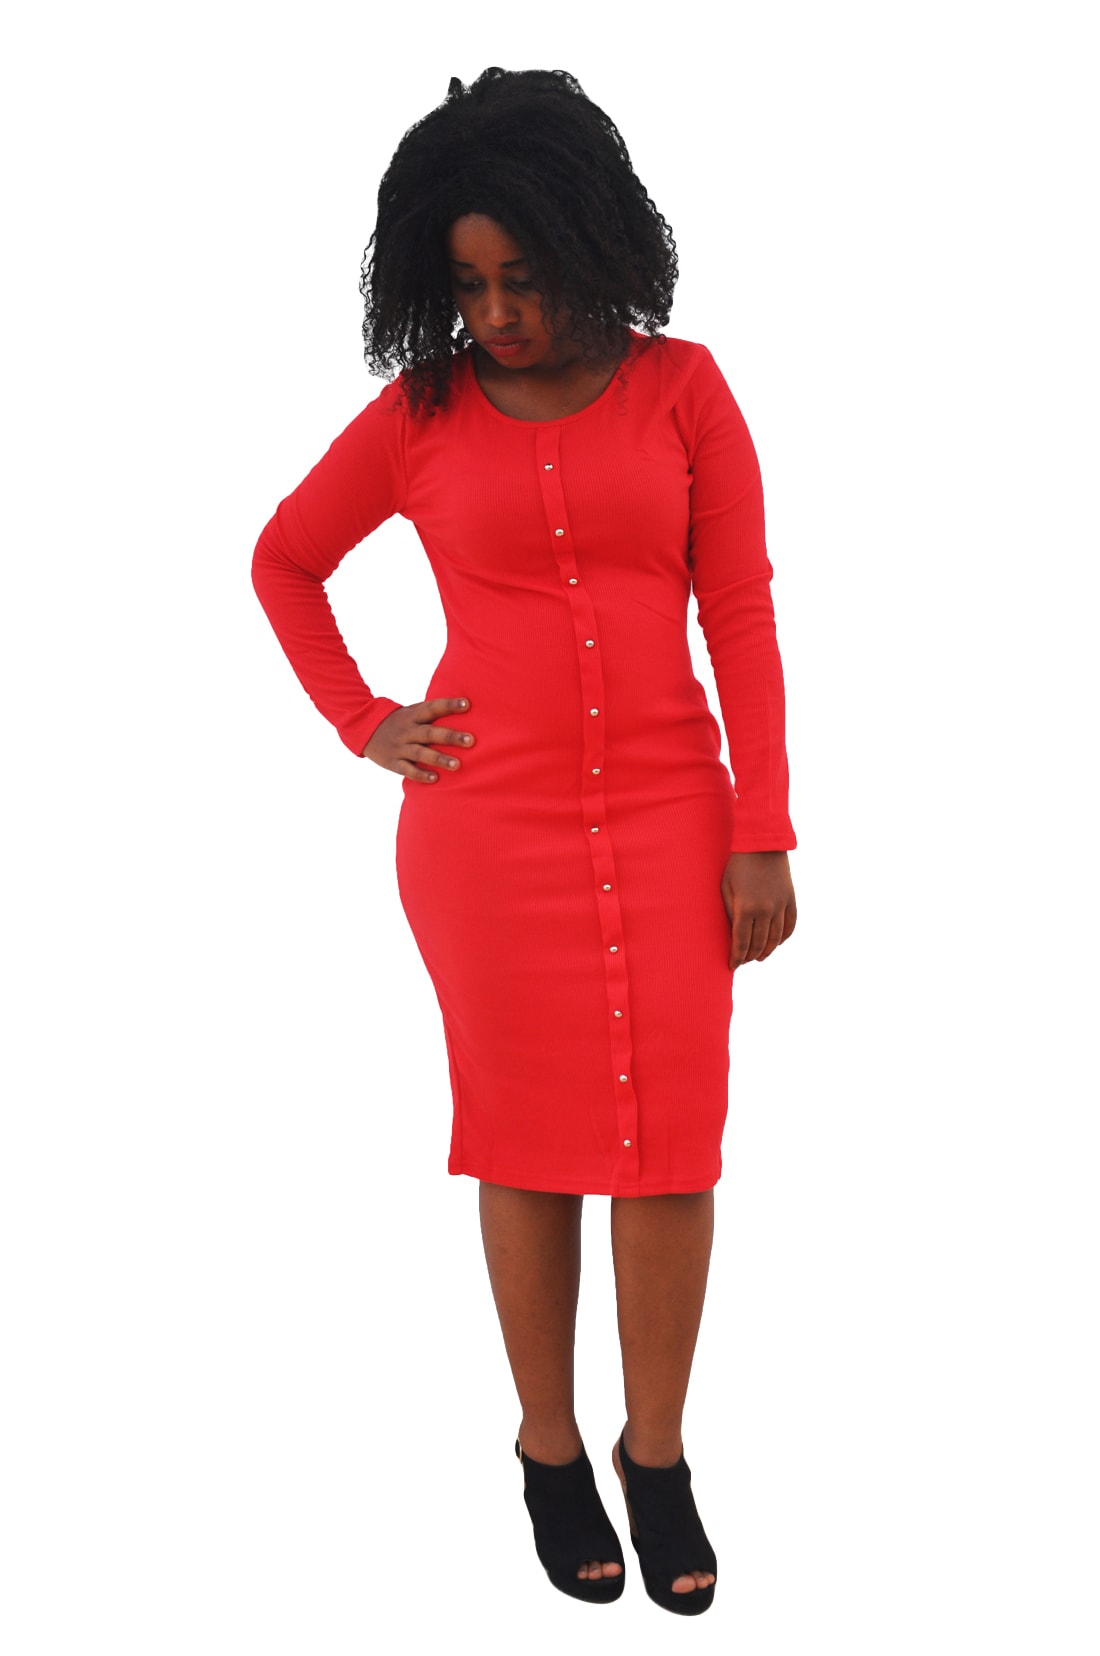 M0253 red1 Office Evening Dresses maureens.com boutique